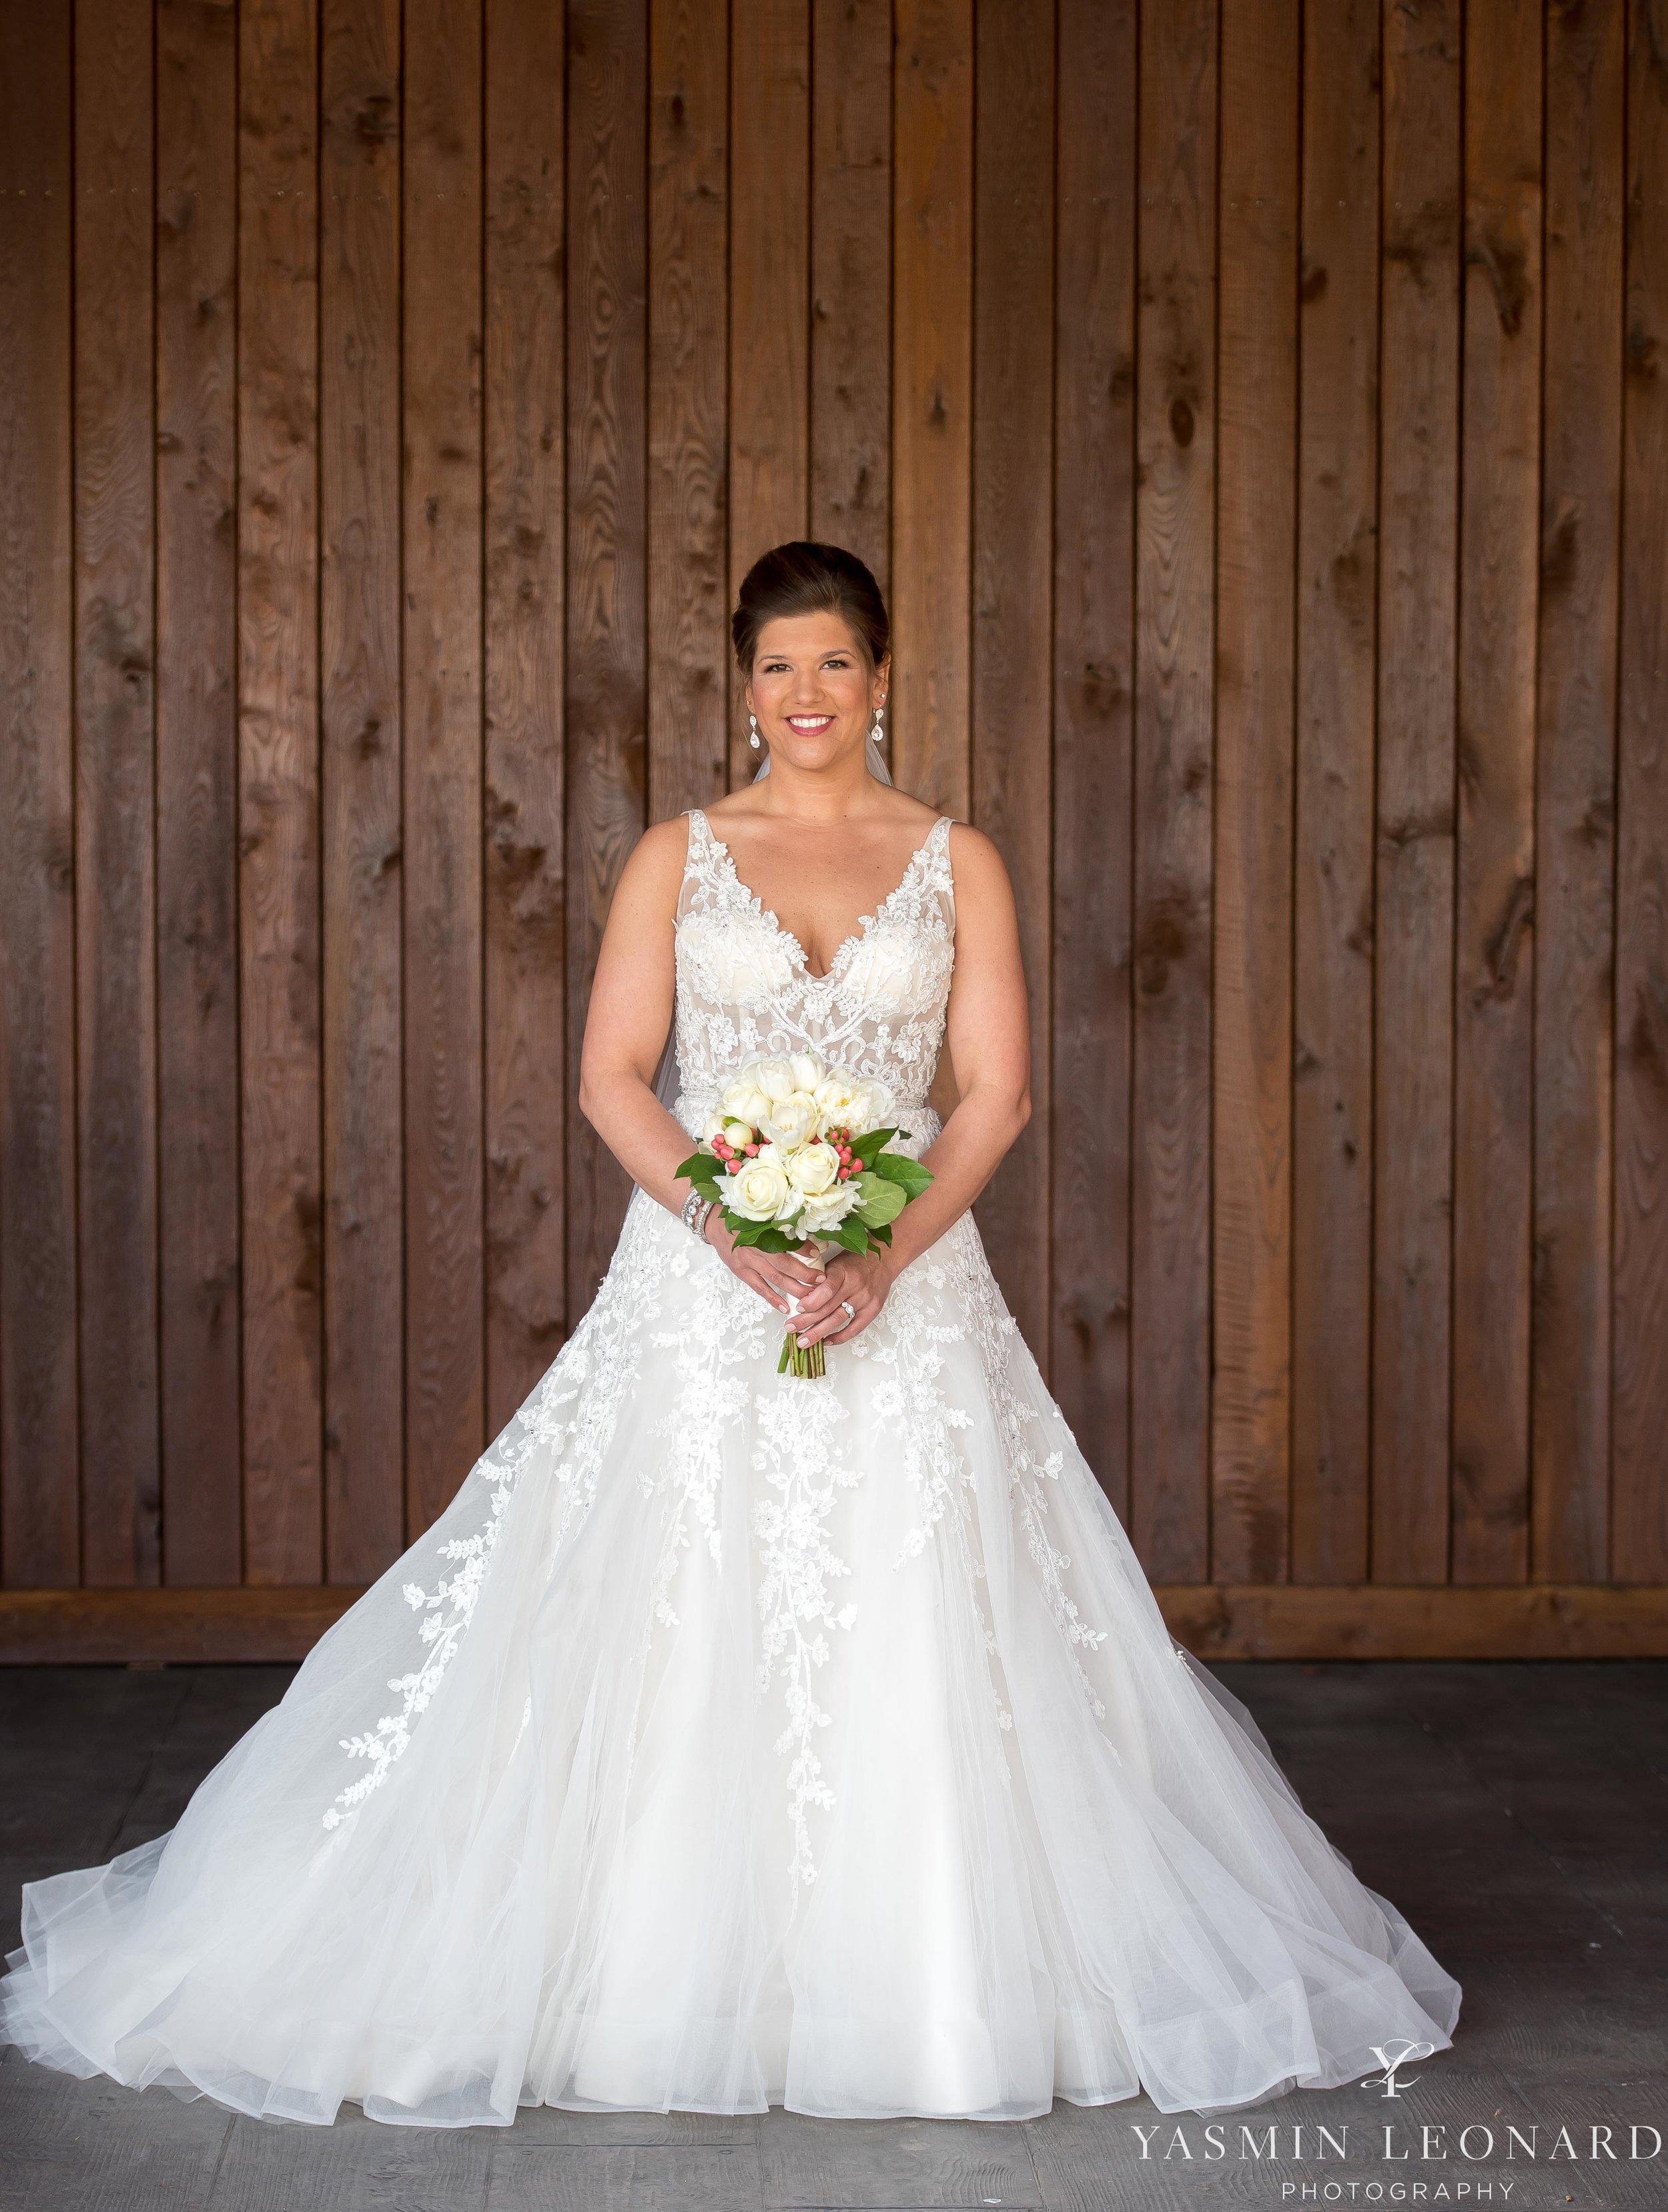 Adaumont Farm - Adaumont Farm Weddings - Trinity Weddings - NC Weddings - Yasmin Leonard Photography-19.jpg